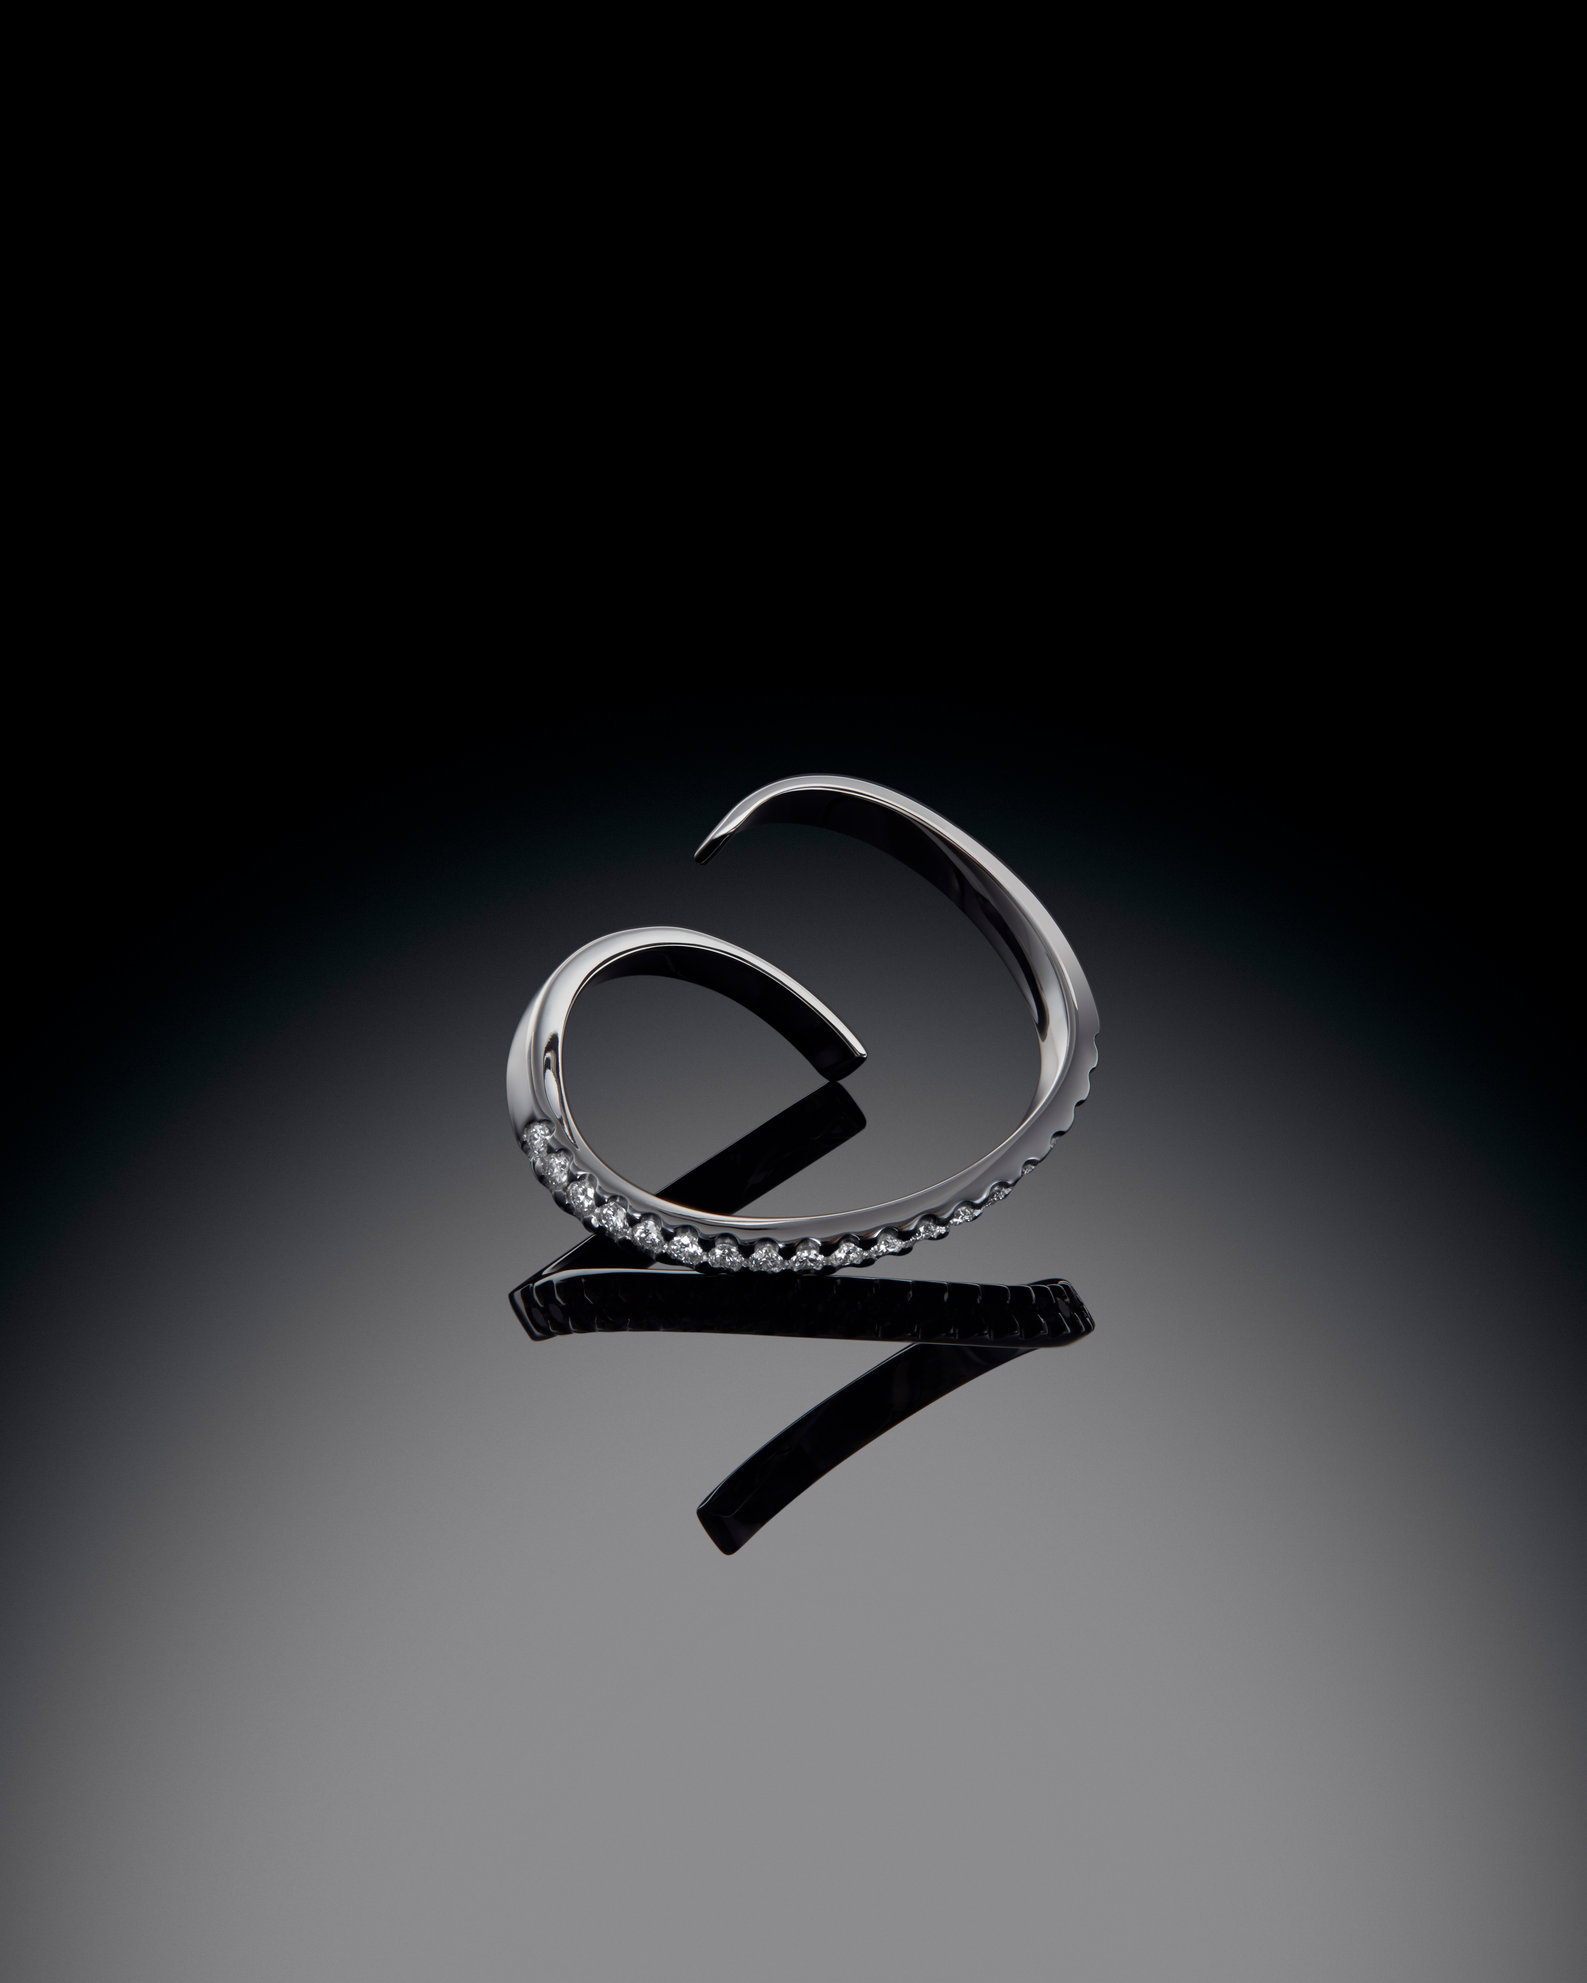 Shot2_Ben Reeves-Anfray Jewellery_V3.jpg